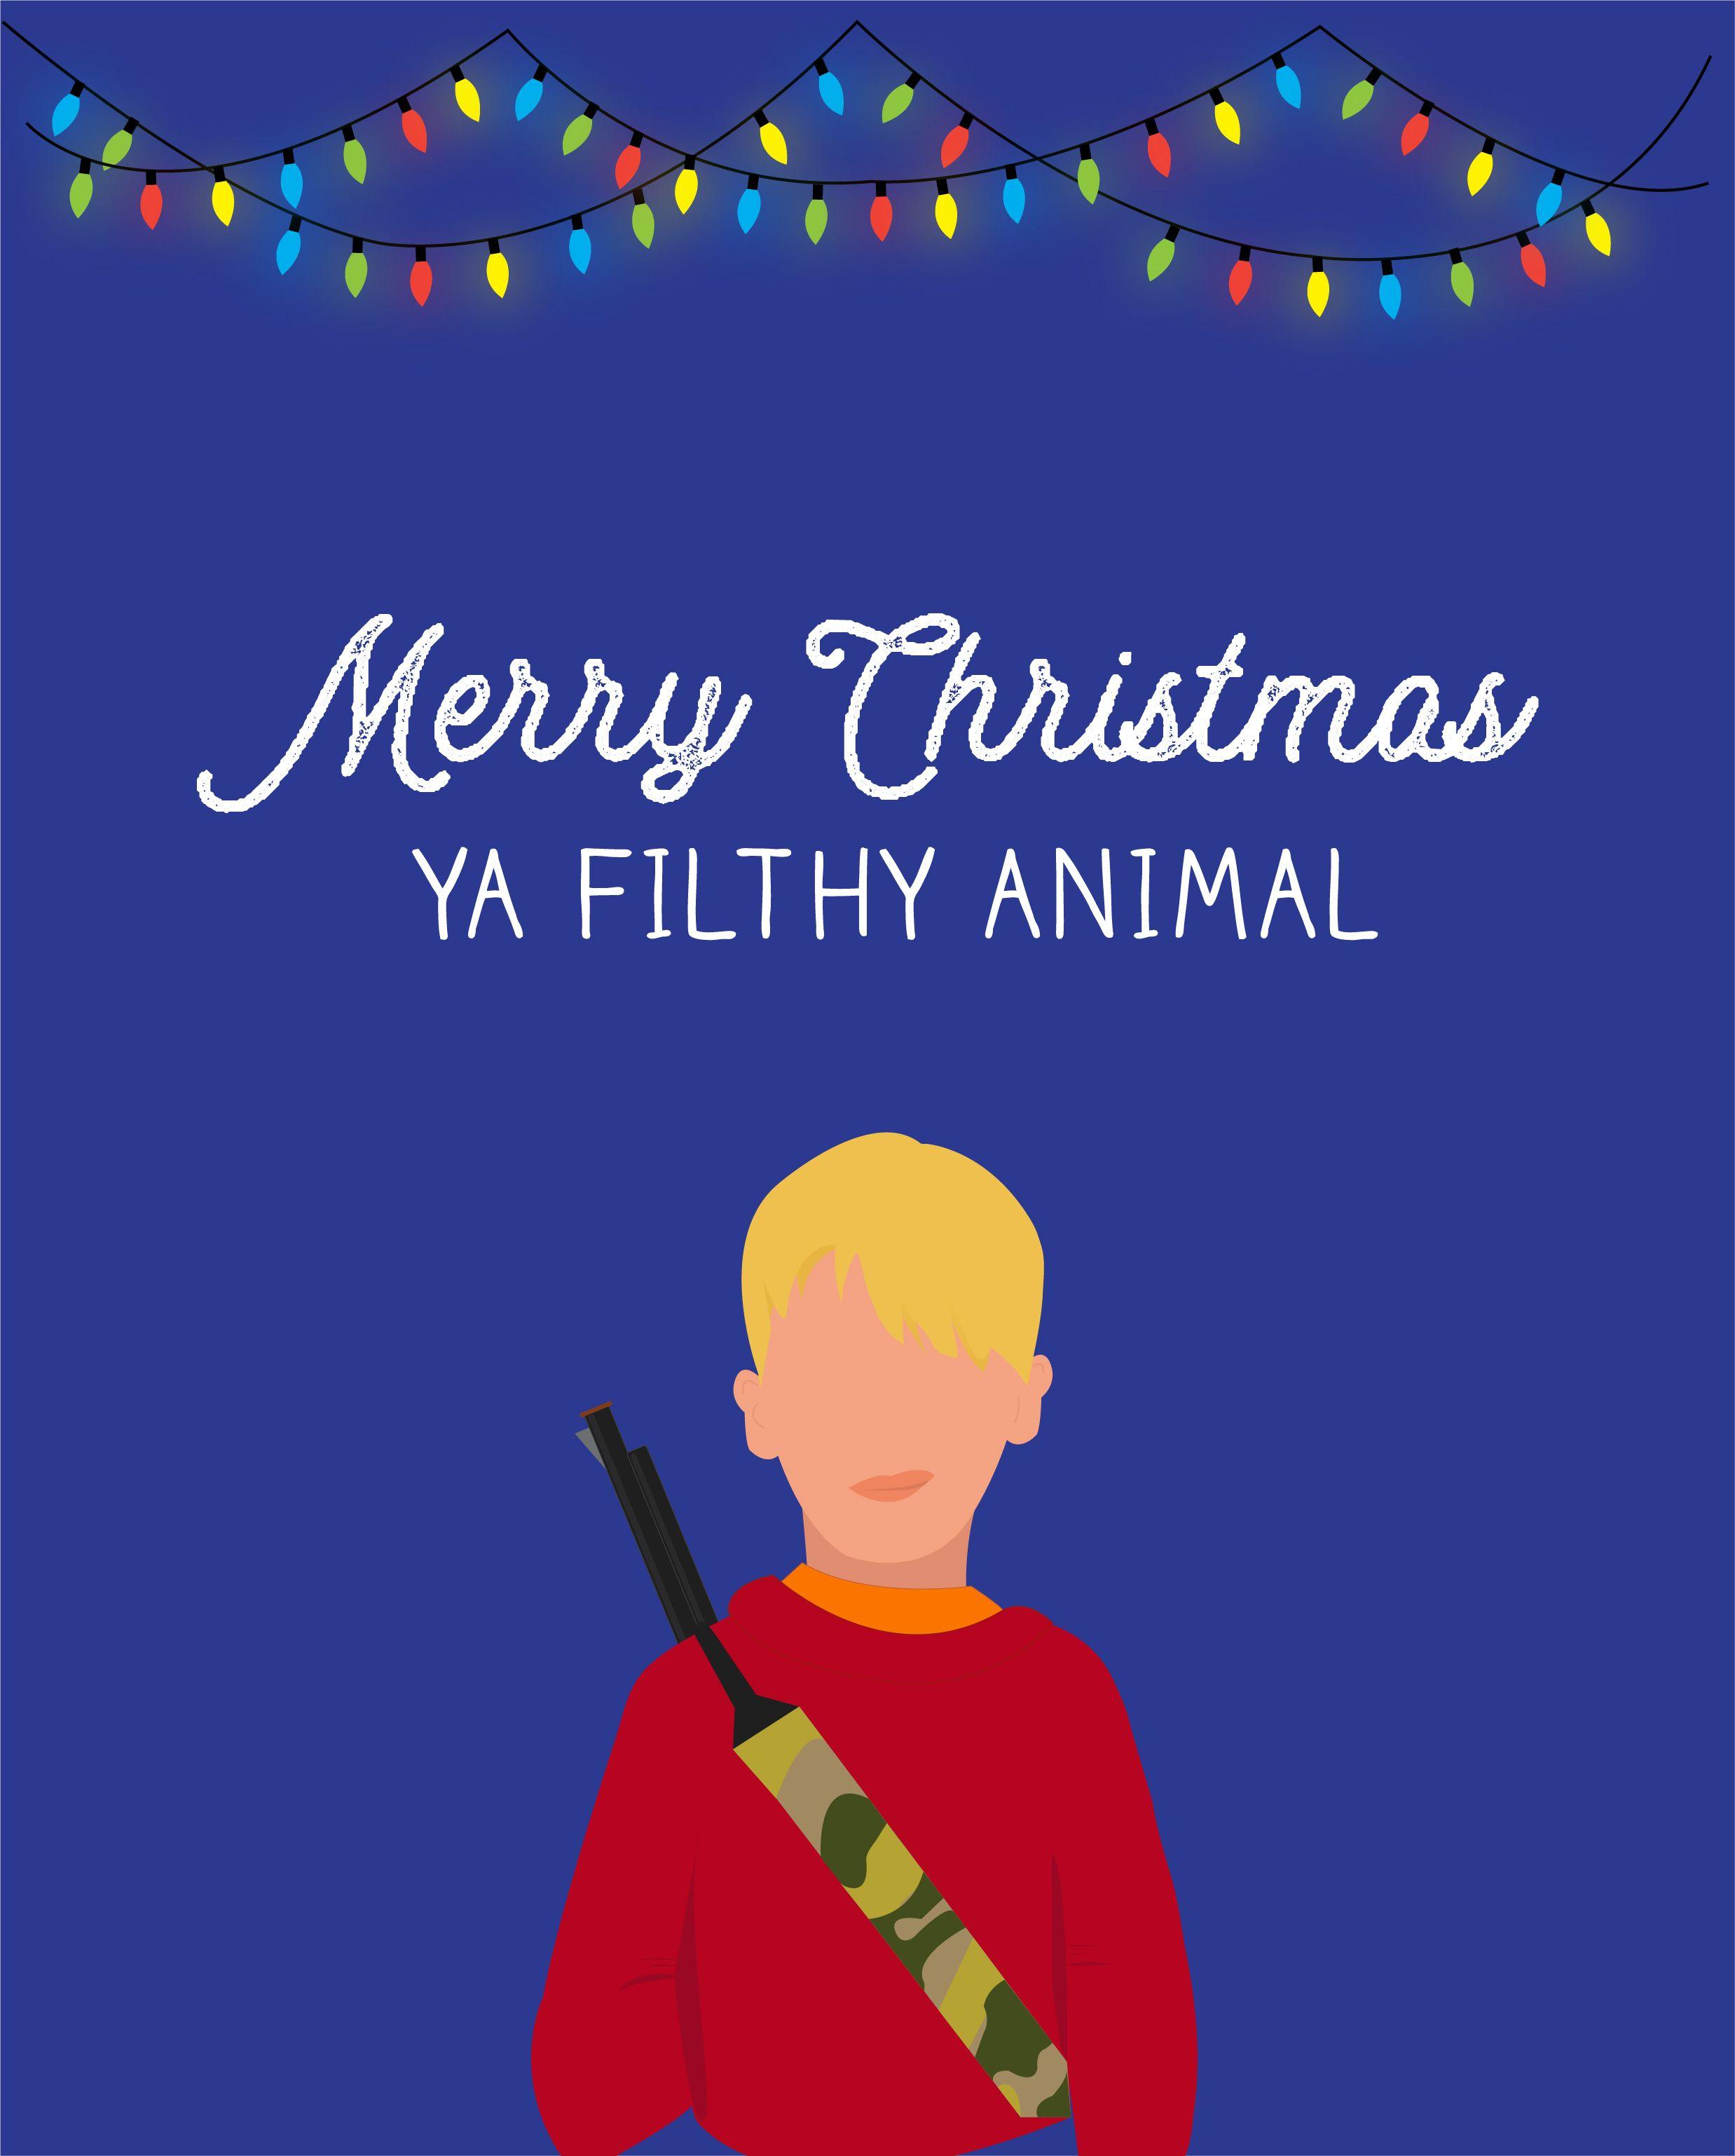 07da0da2 Merry Christmas Ya Filthy Animal || Home Alone || Christmas Decorations